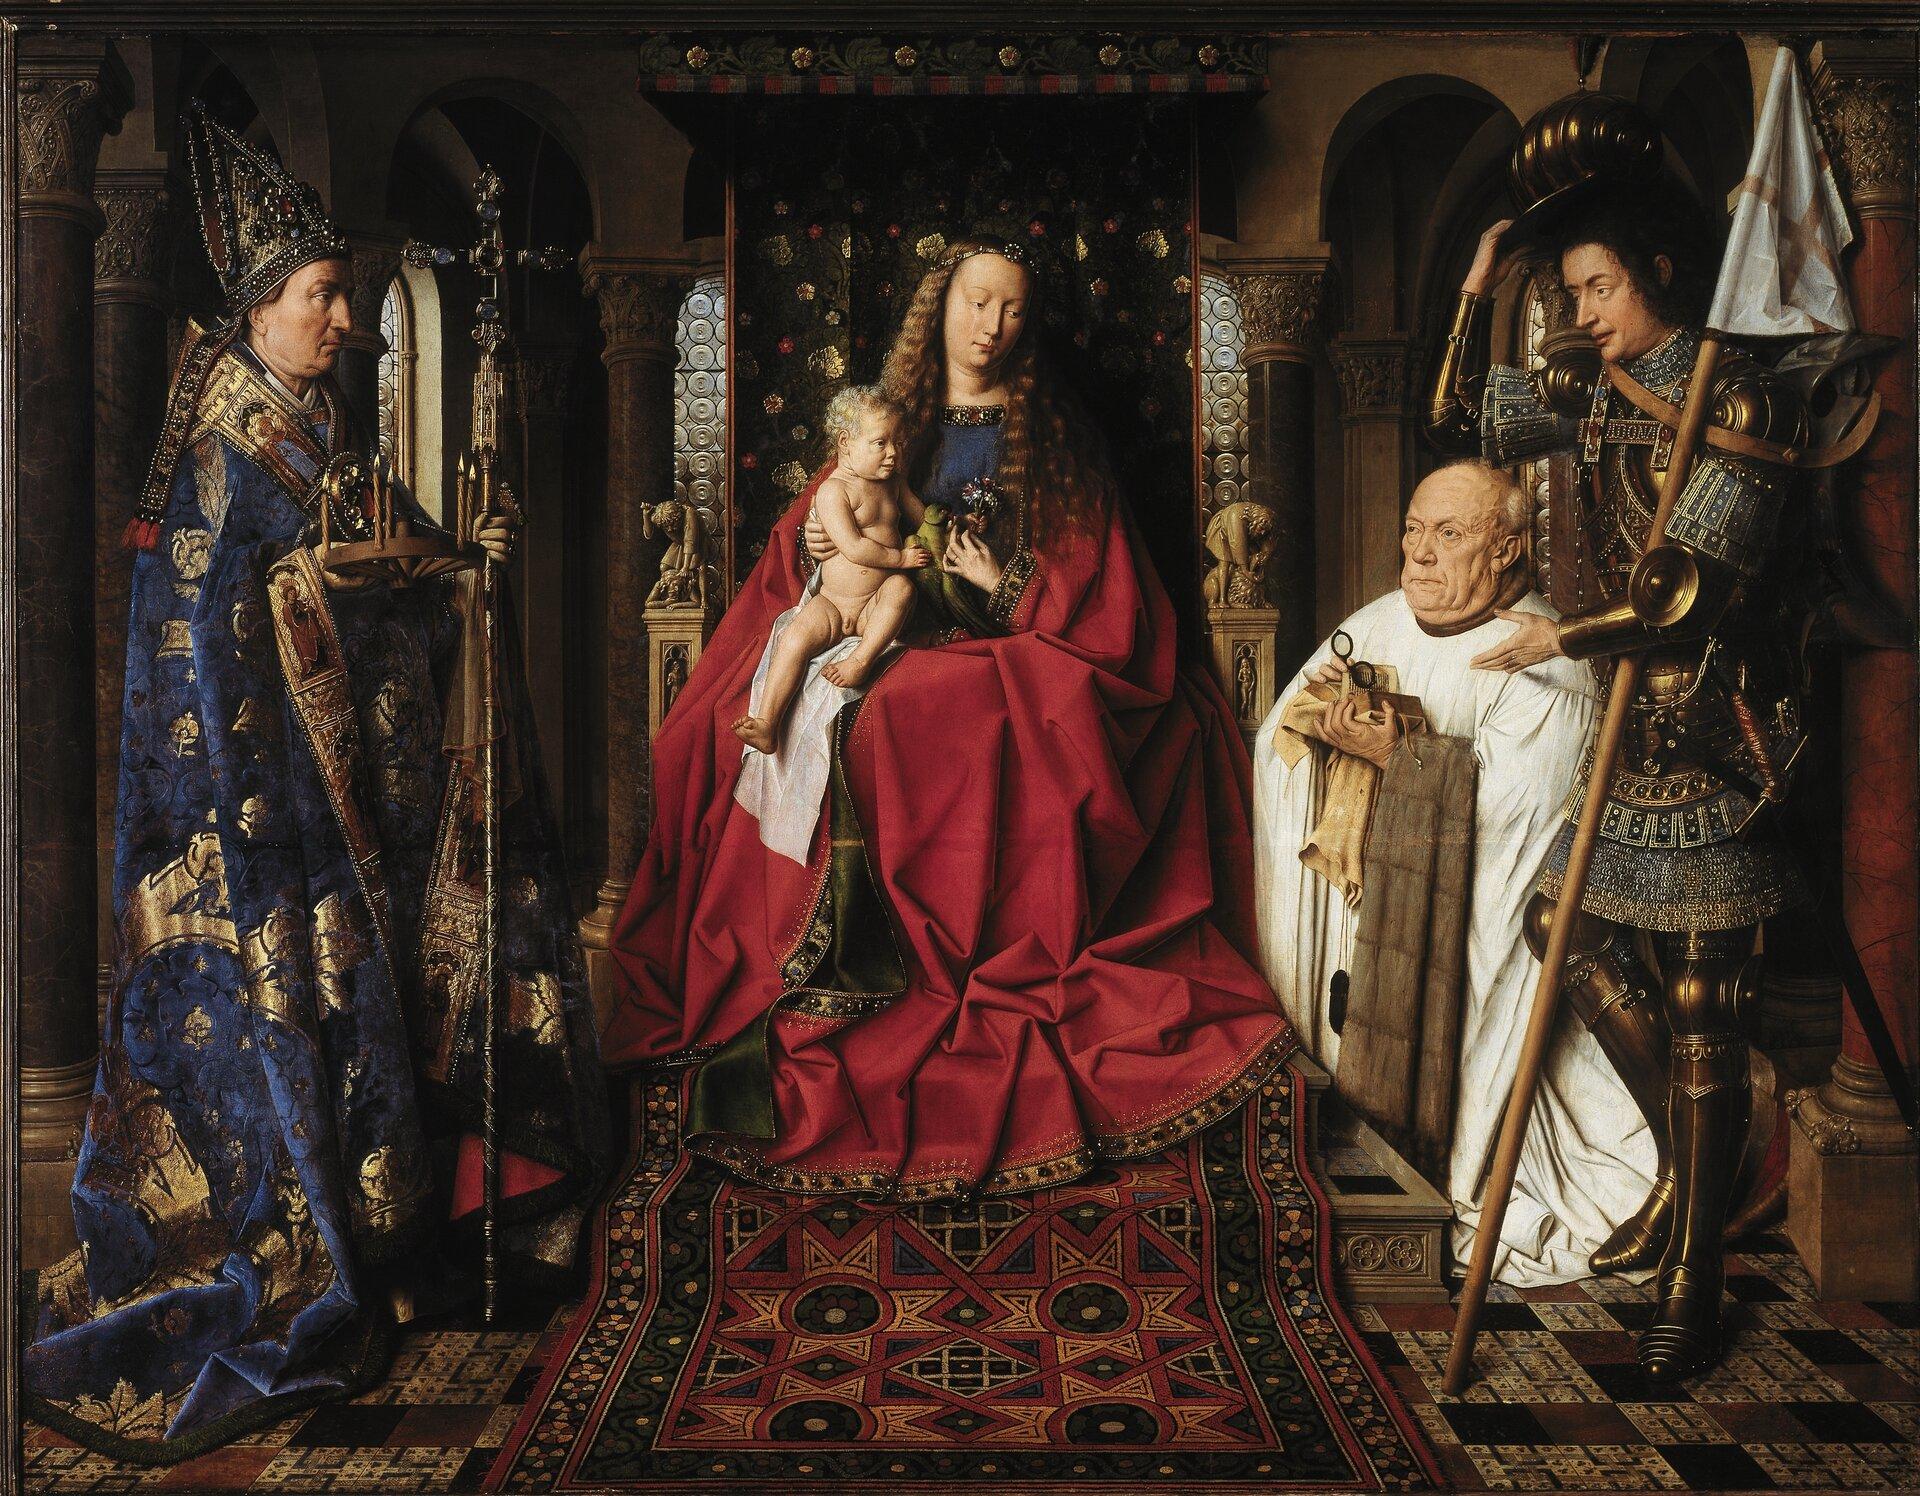 Madonna kanonika van der Paele Źródło: Jan van Eyck, Madonna kanonika van der Paele, 1436, tempera / olej na desce, Groeningemuseum, Brugia, domena publiczna.